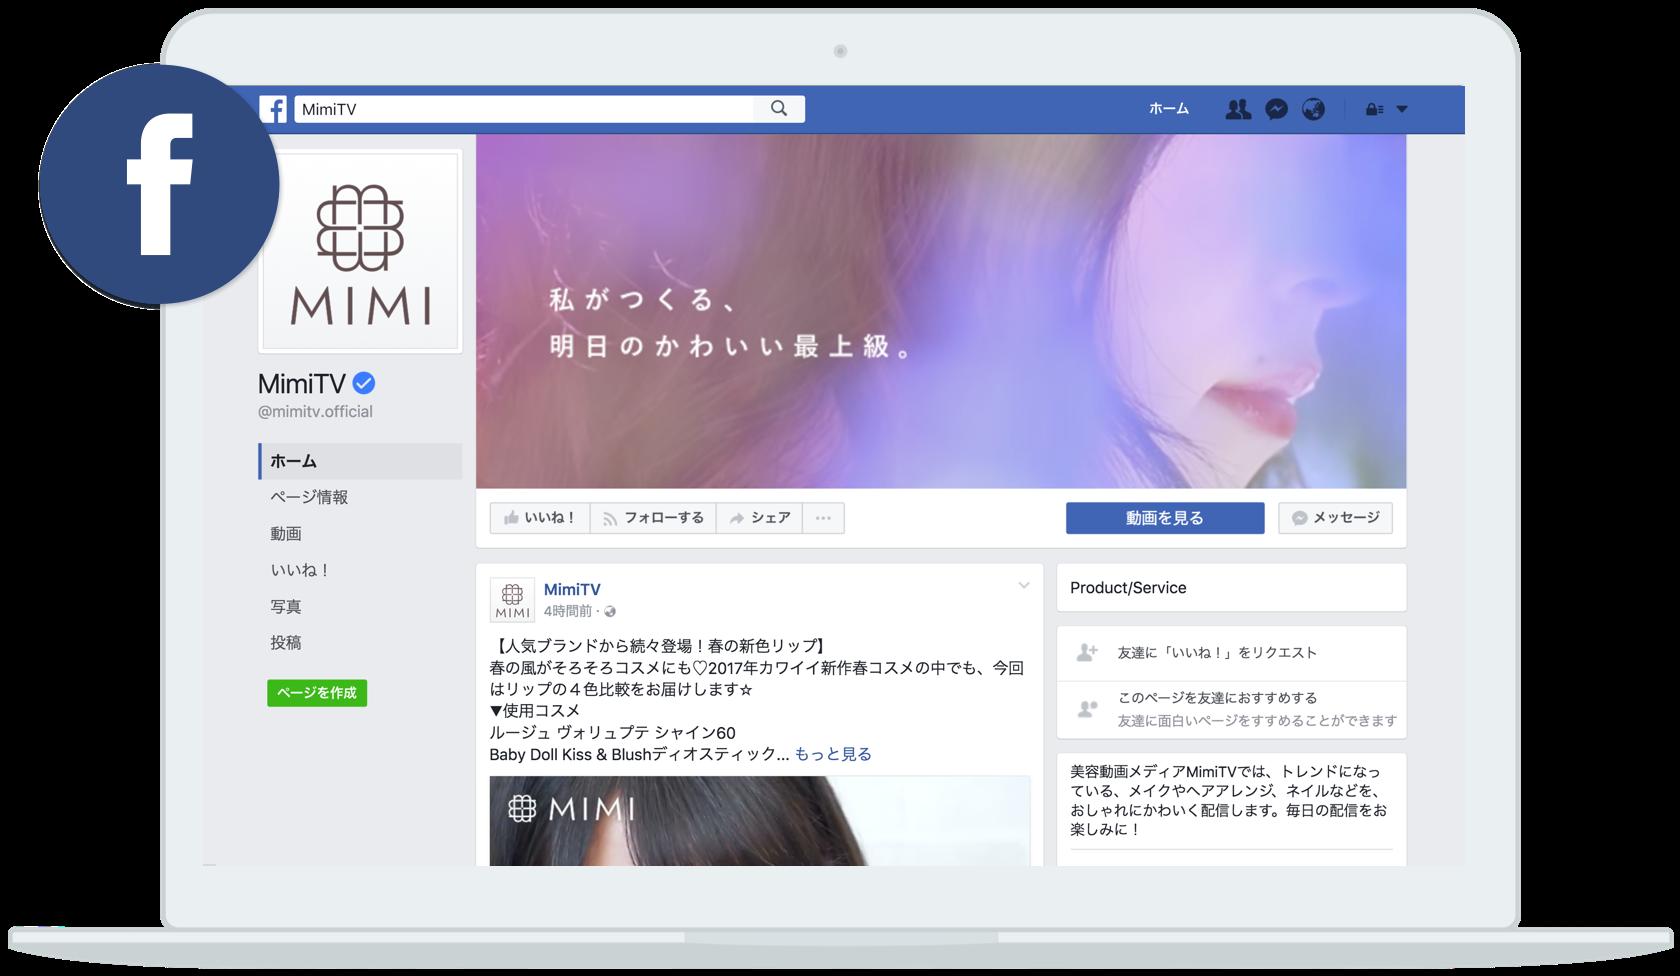 MimiTV facebook